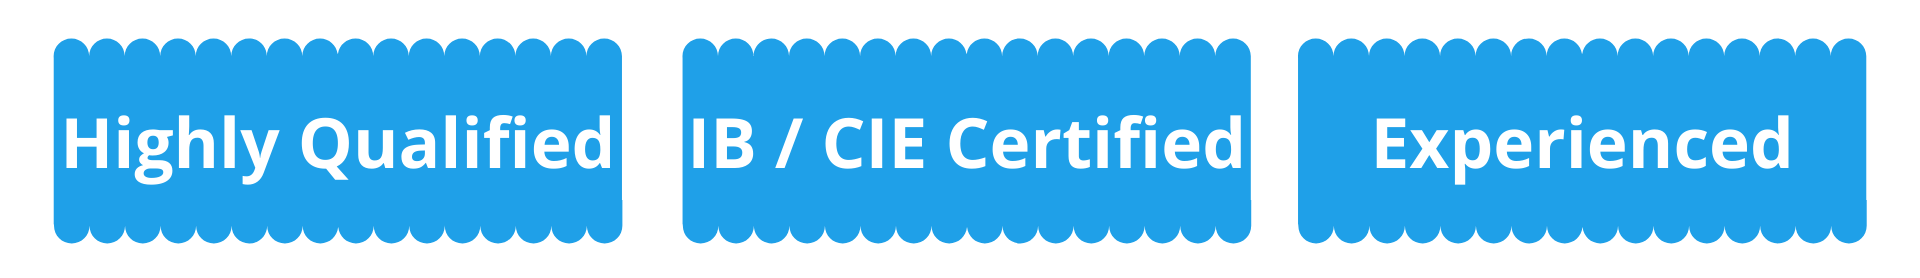 Online classes   Online tuition   IB DP   IB MYP   A/AS-Level   IGCSE   AP   SAT   ACT   Edexcel   AQA   OCR